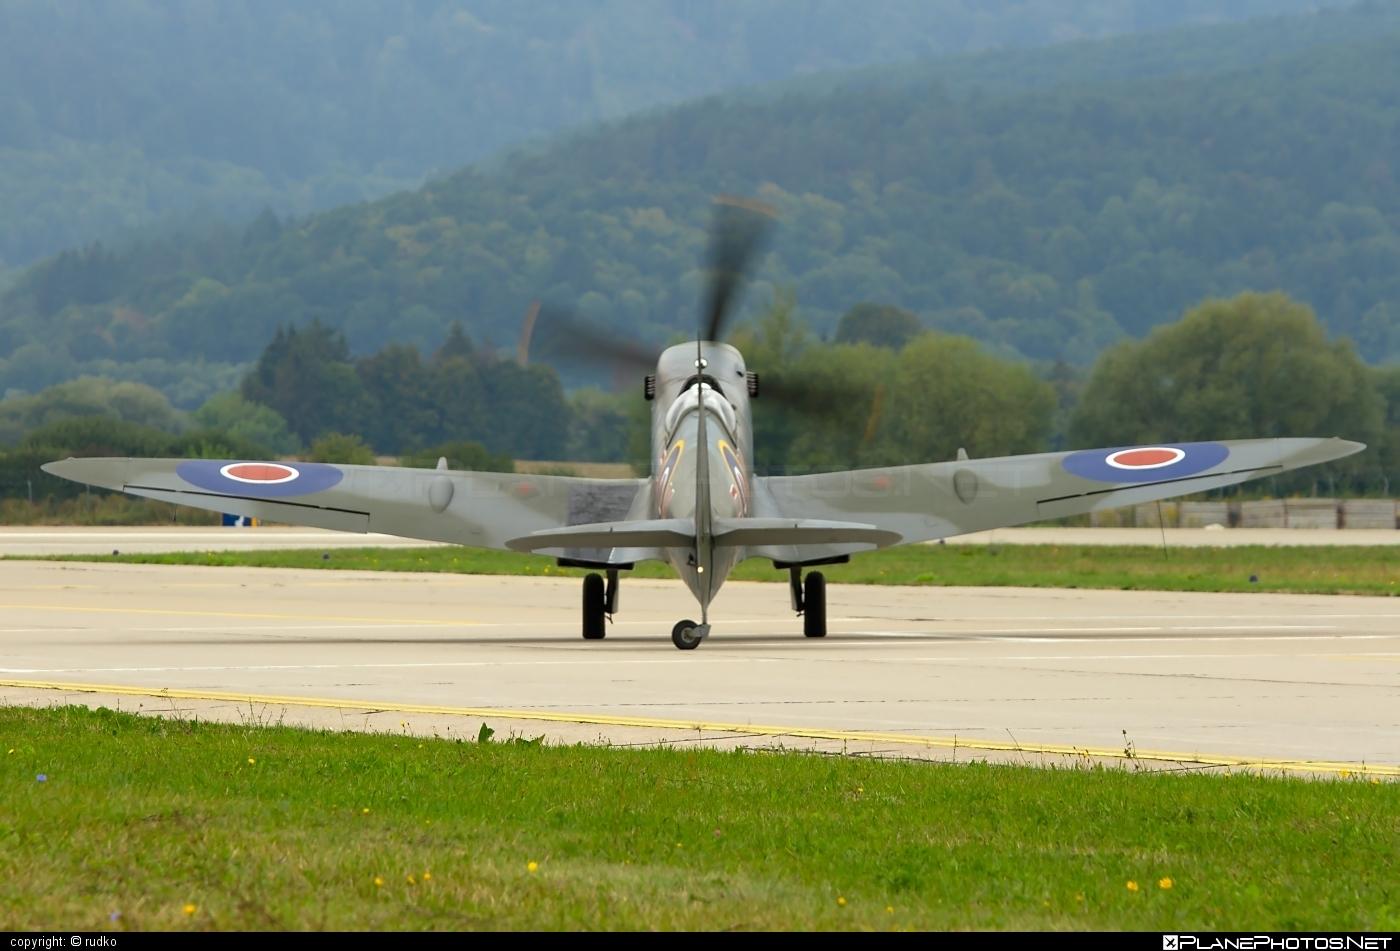 Supermarine Spitfire LF Mk.XVIe - G-MXVI operated by Private operator #spitfire #spitfirelfmkxvie #supermarine #supermarinespitfire #supermarinespitfirelfmkxvie